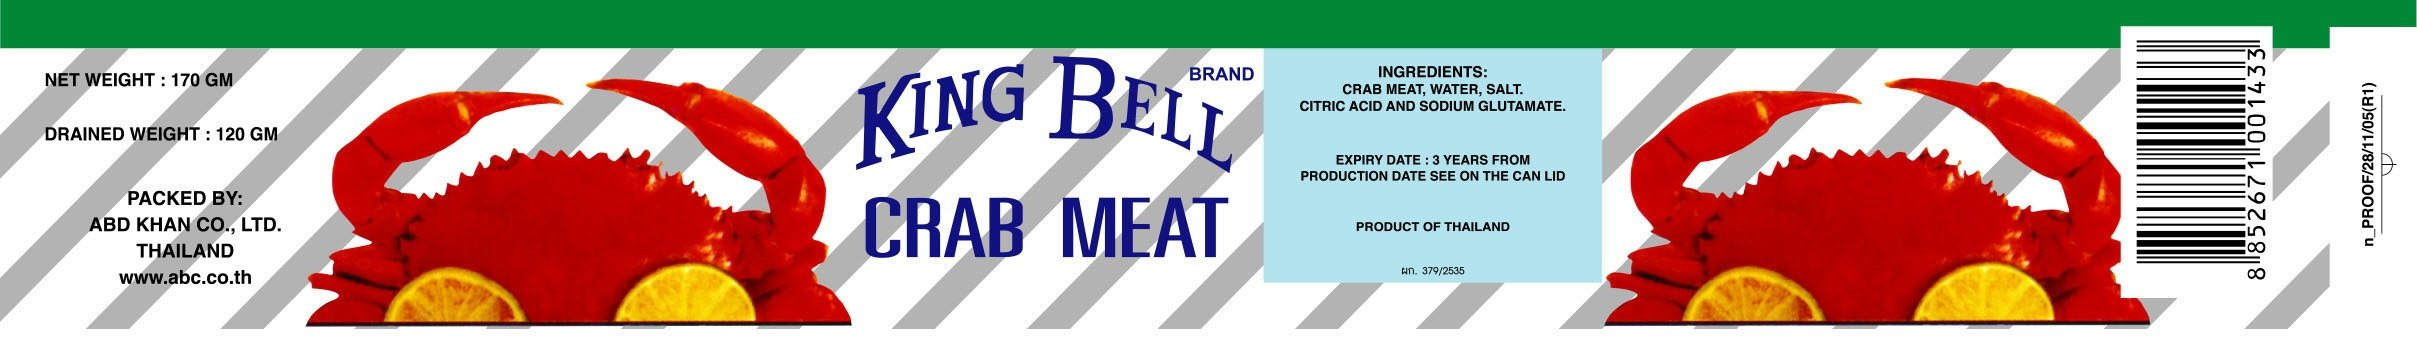 Crabmeat in Brine - 170 gms x 24